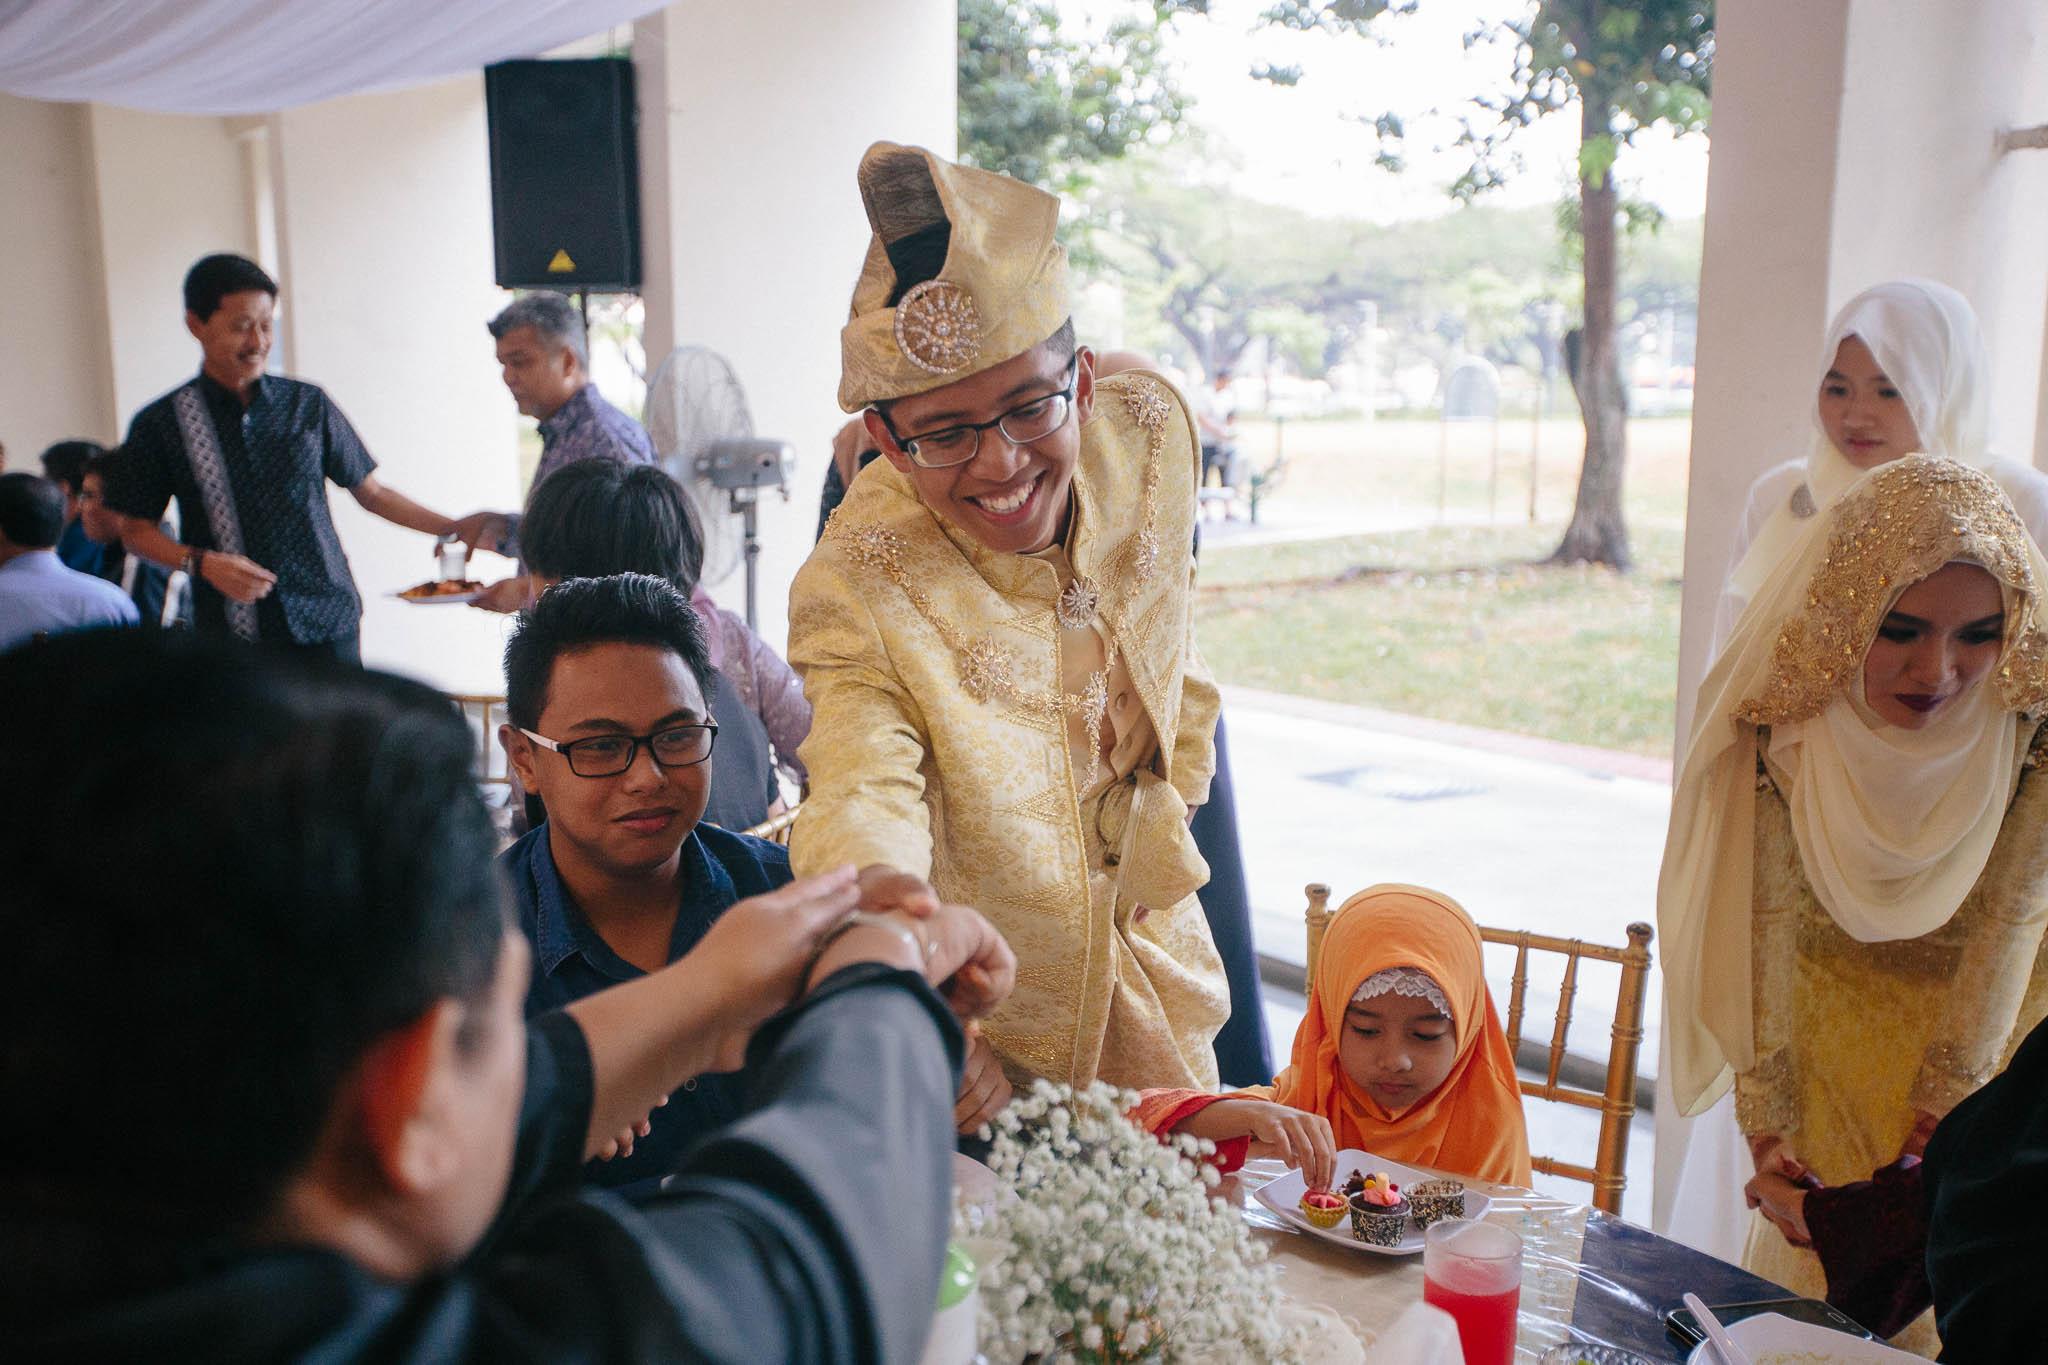 singapore-wedding-photographer-sharalyn-syazwan-051.jpg